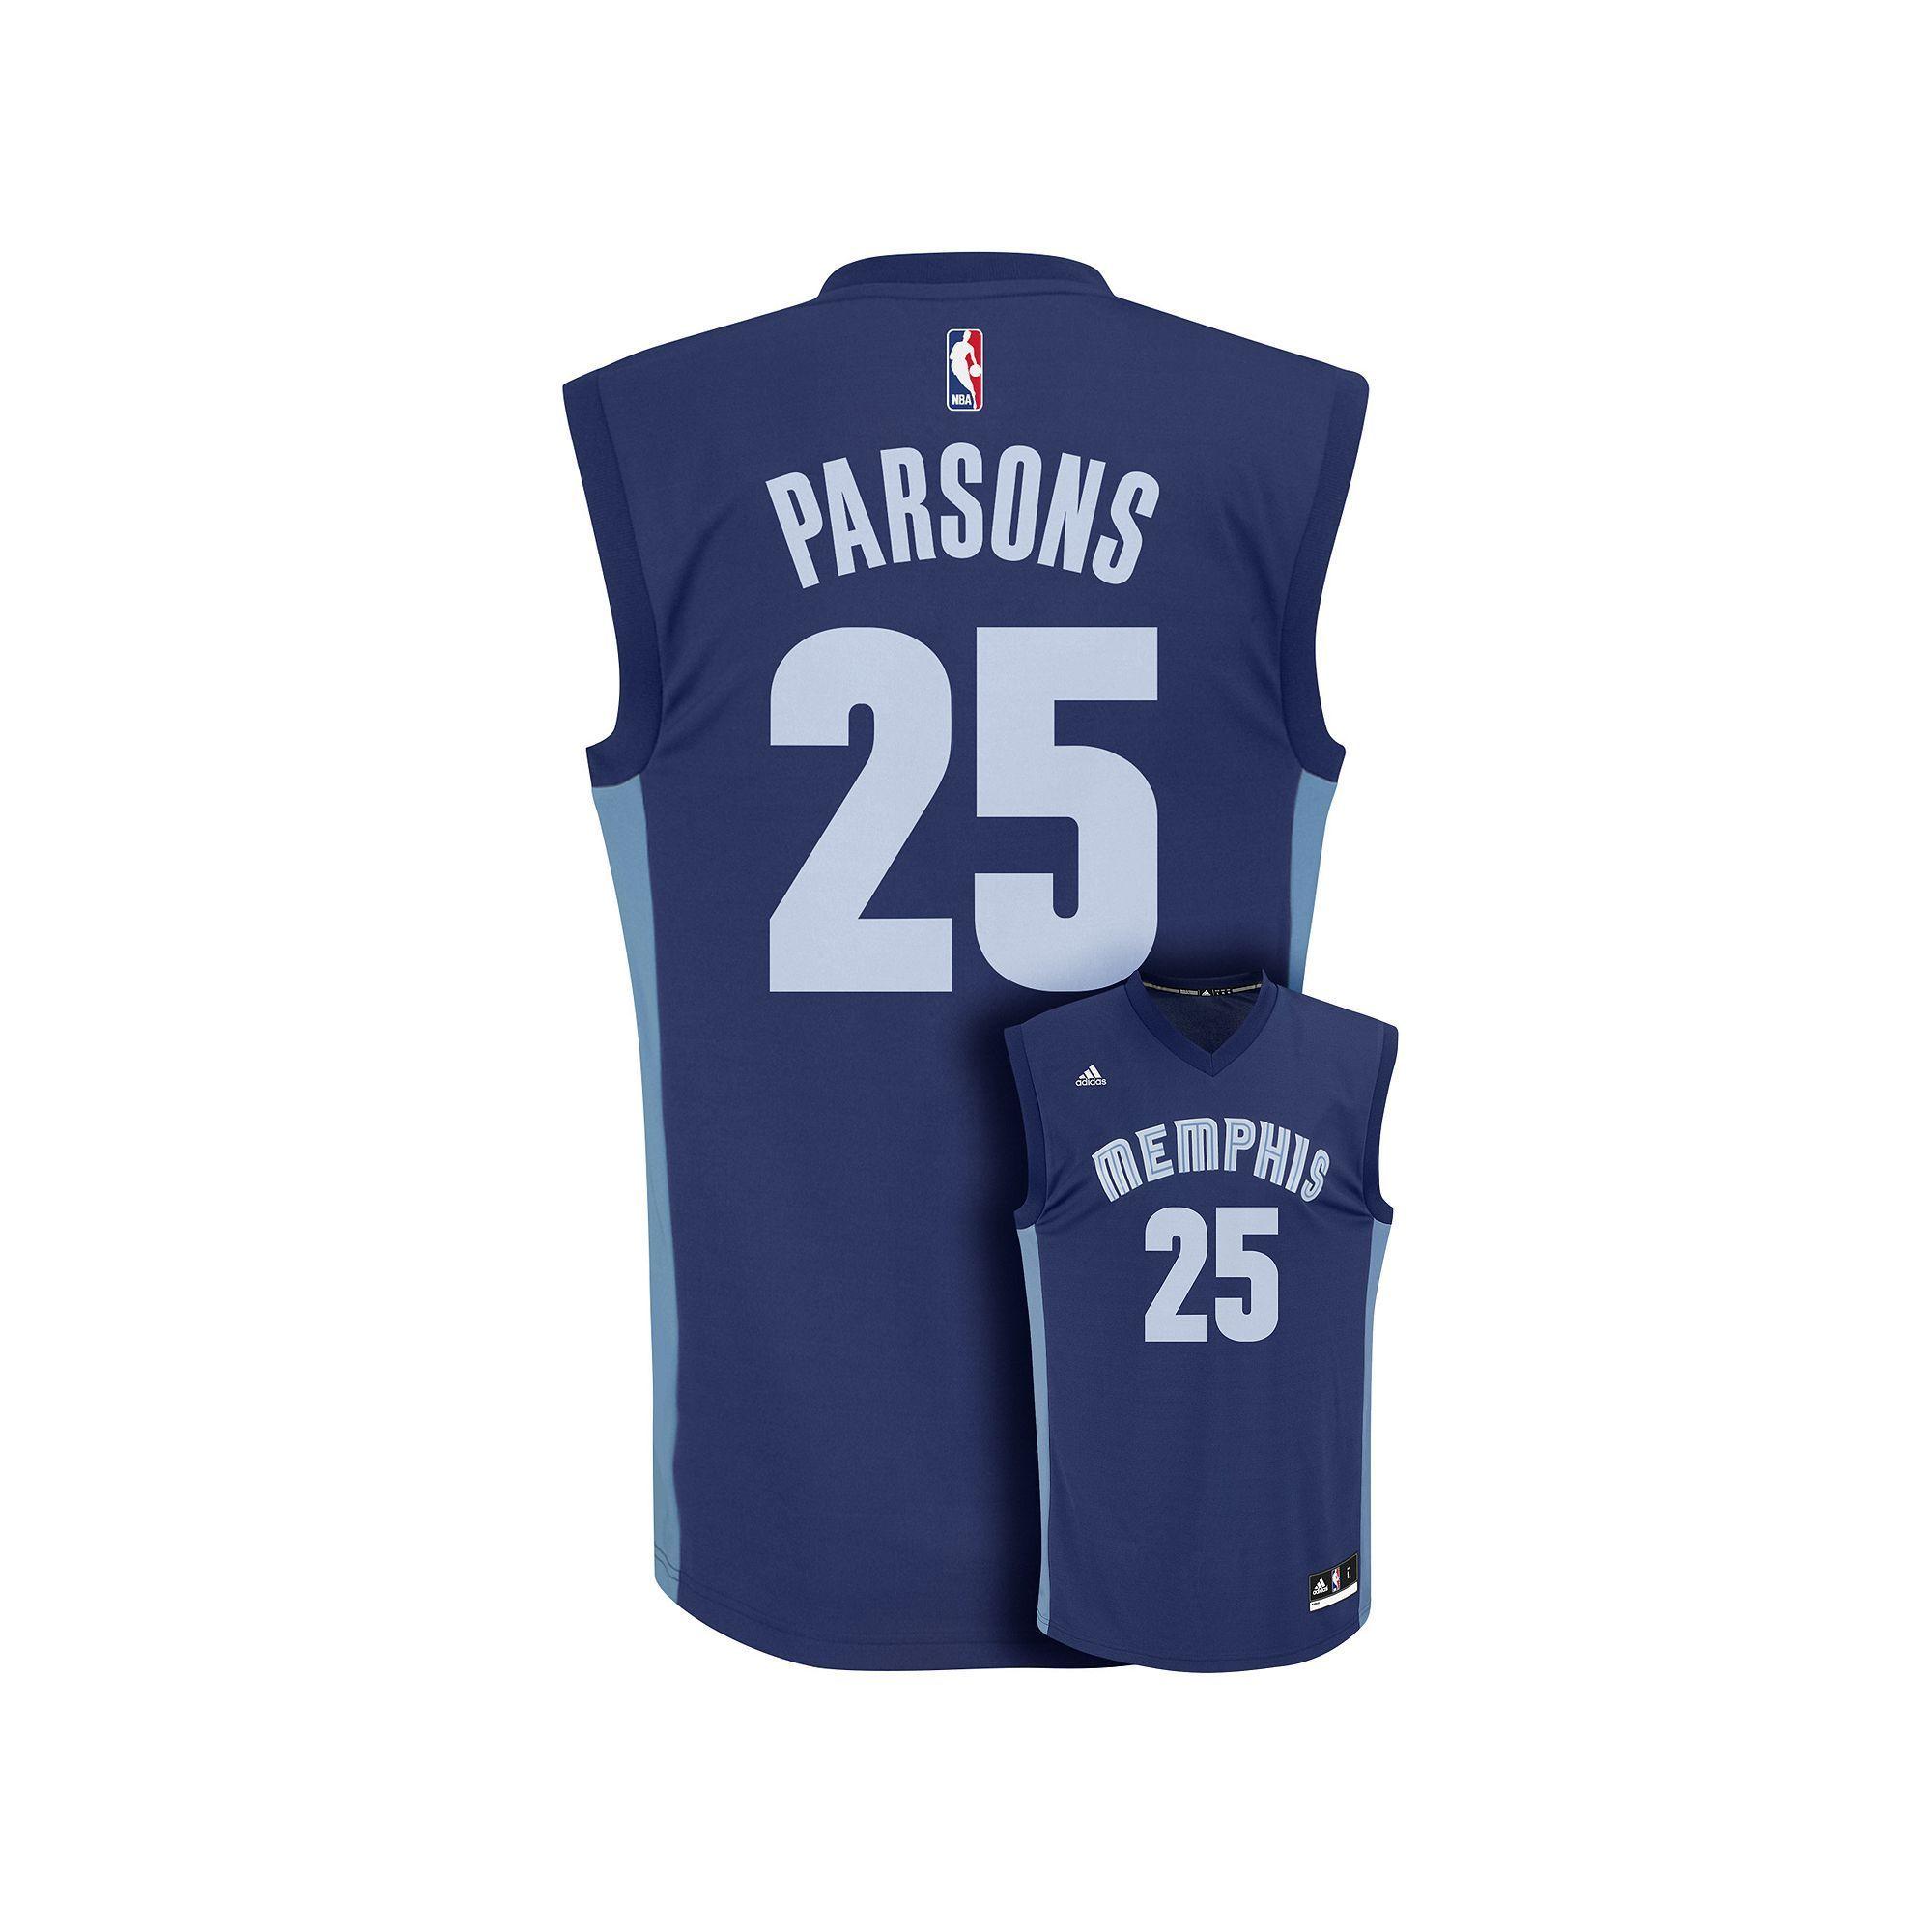 4805c963477 Men's Adidas Memphis Grizzlies Chandler Parsons NBA Replica Jersey, Size:  Medium, Blue (Navy)